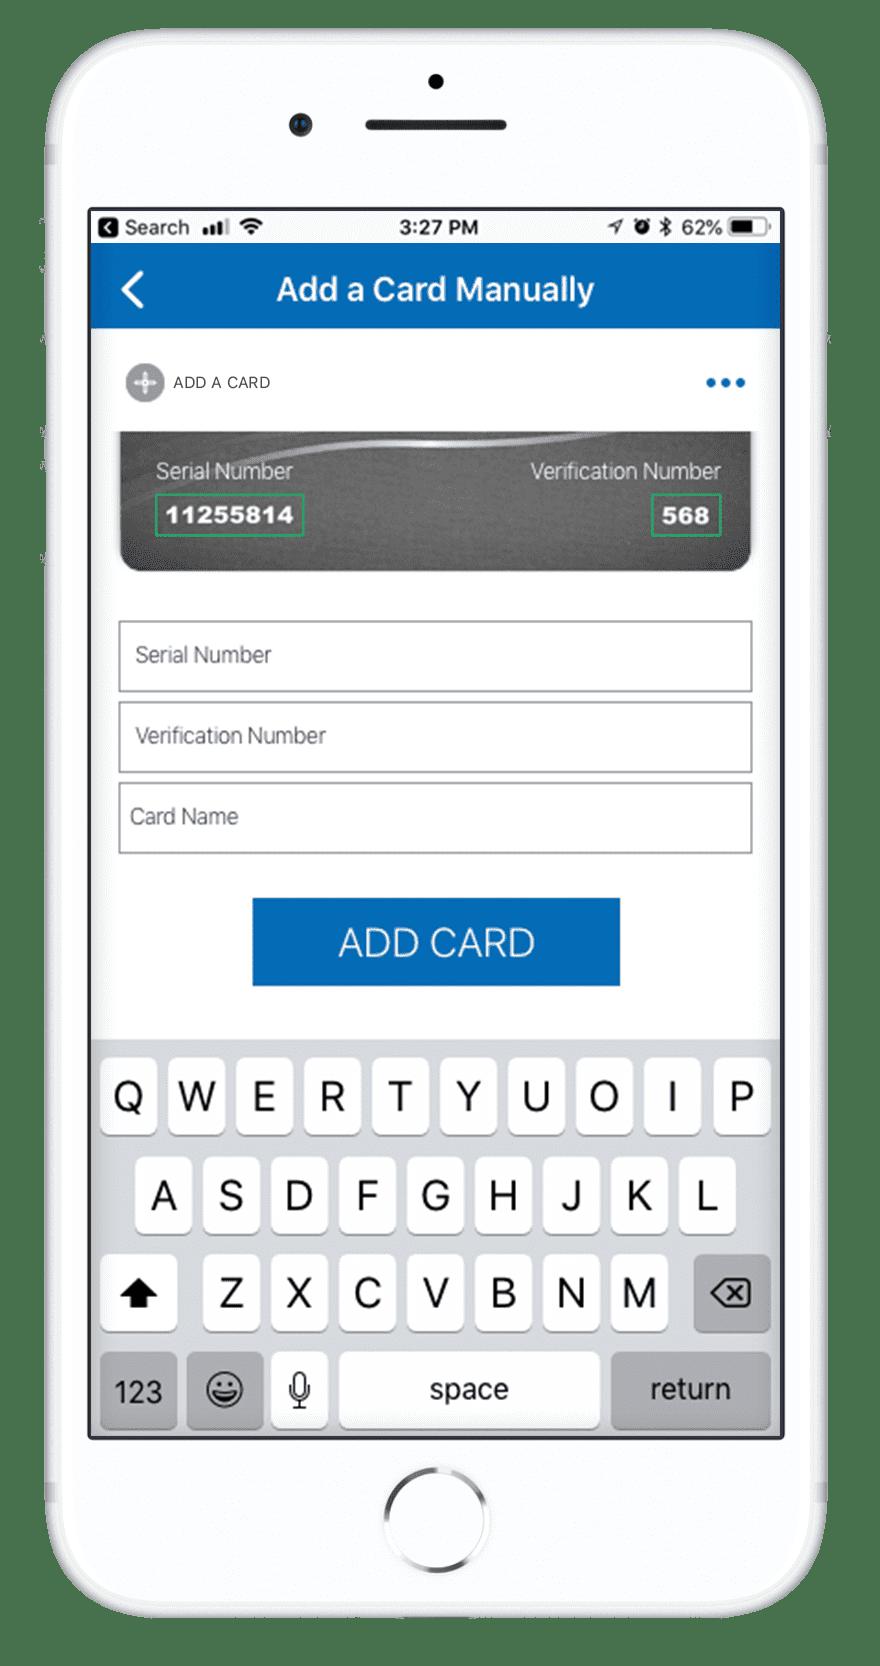 Orca Card 2 - Add a Card Manually Screen